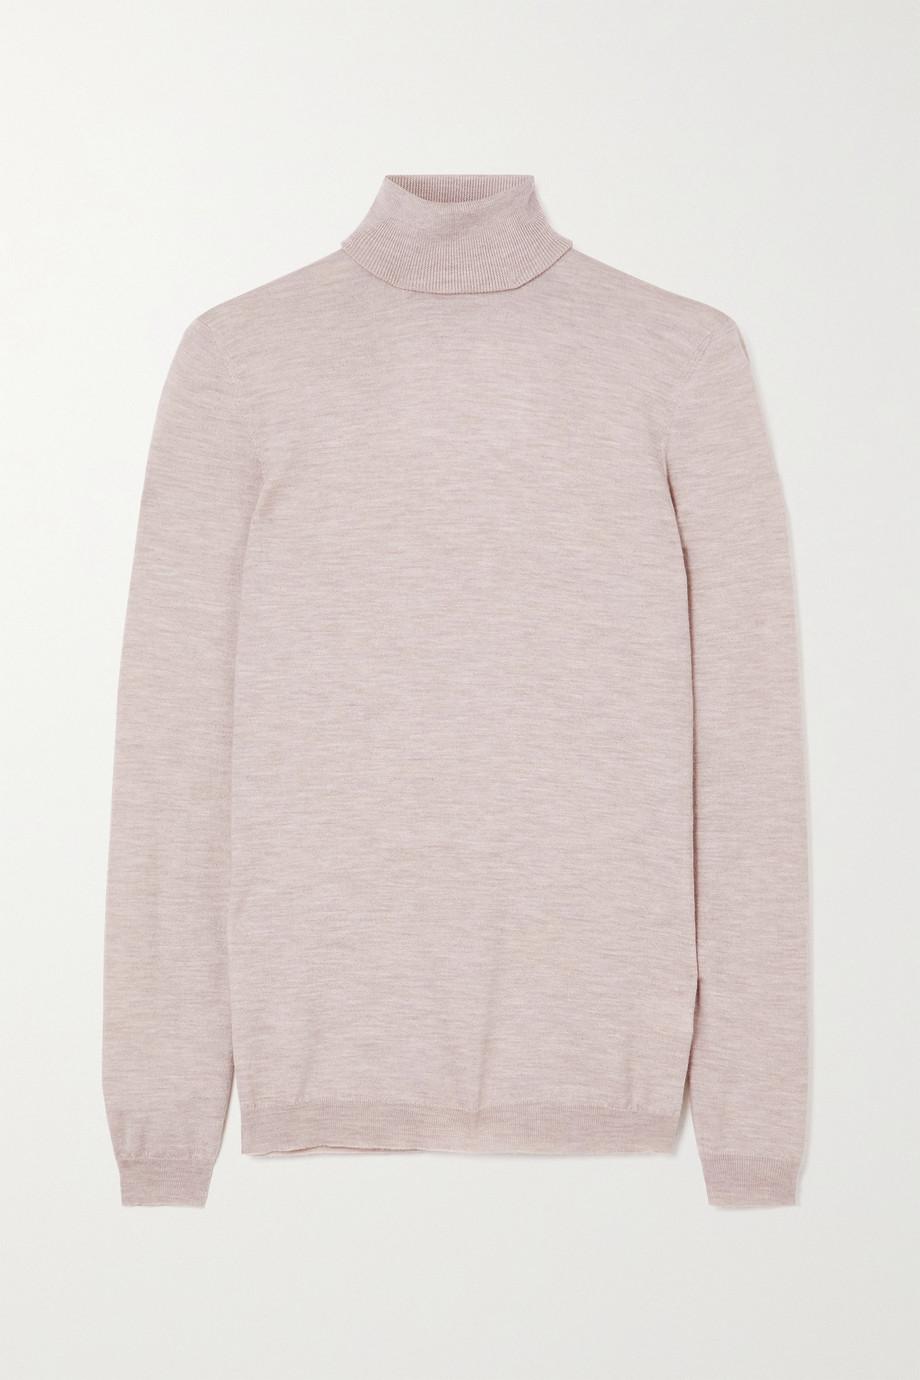 Brunello Cucinelli Cashmere-blend turtleneck sweater